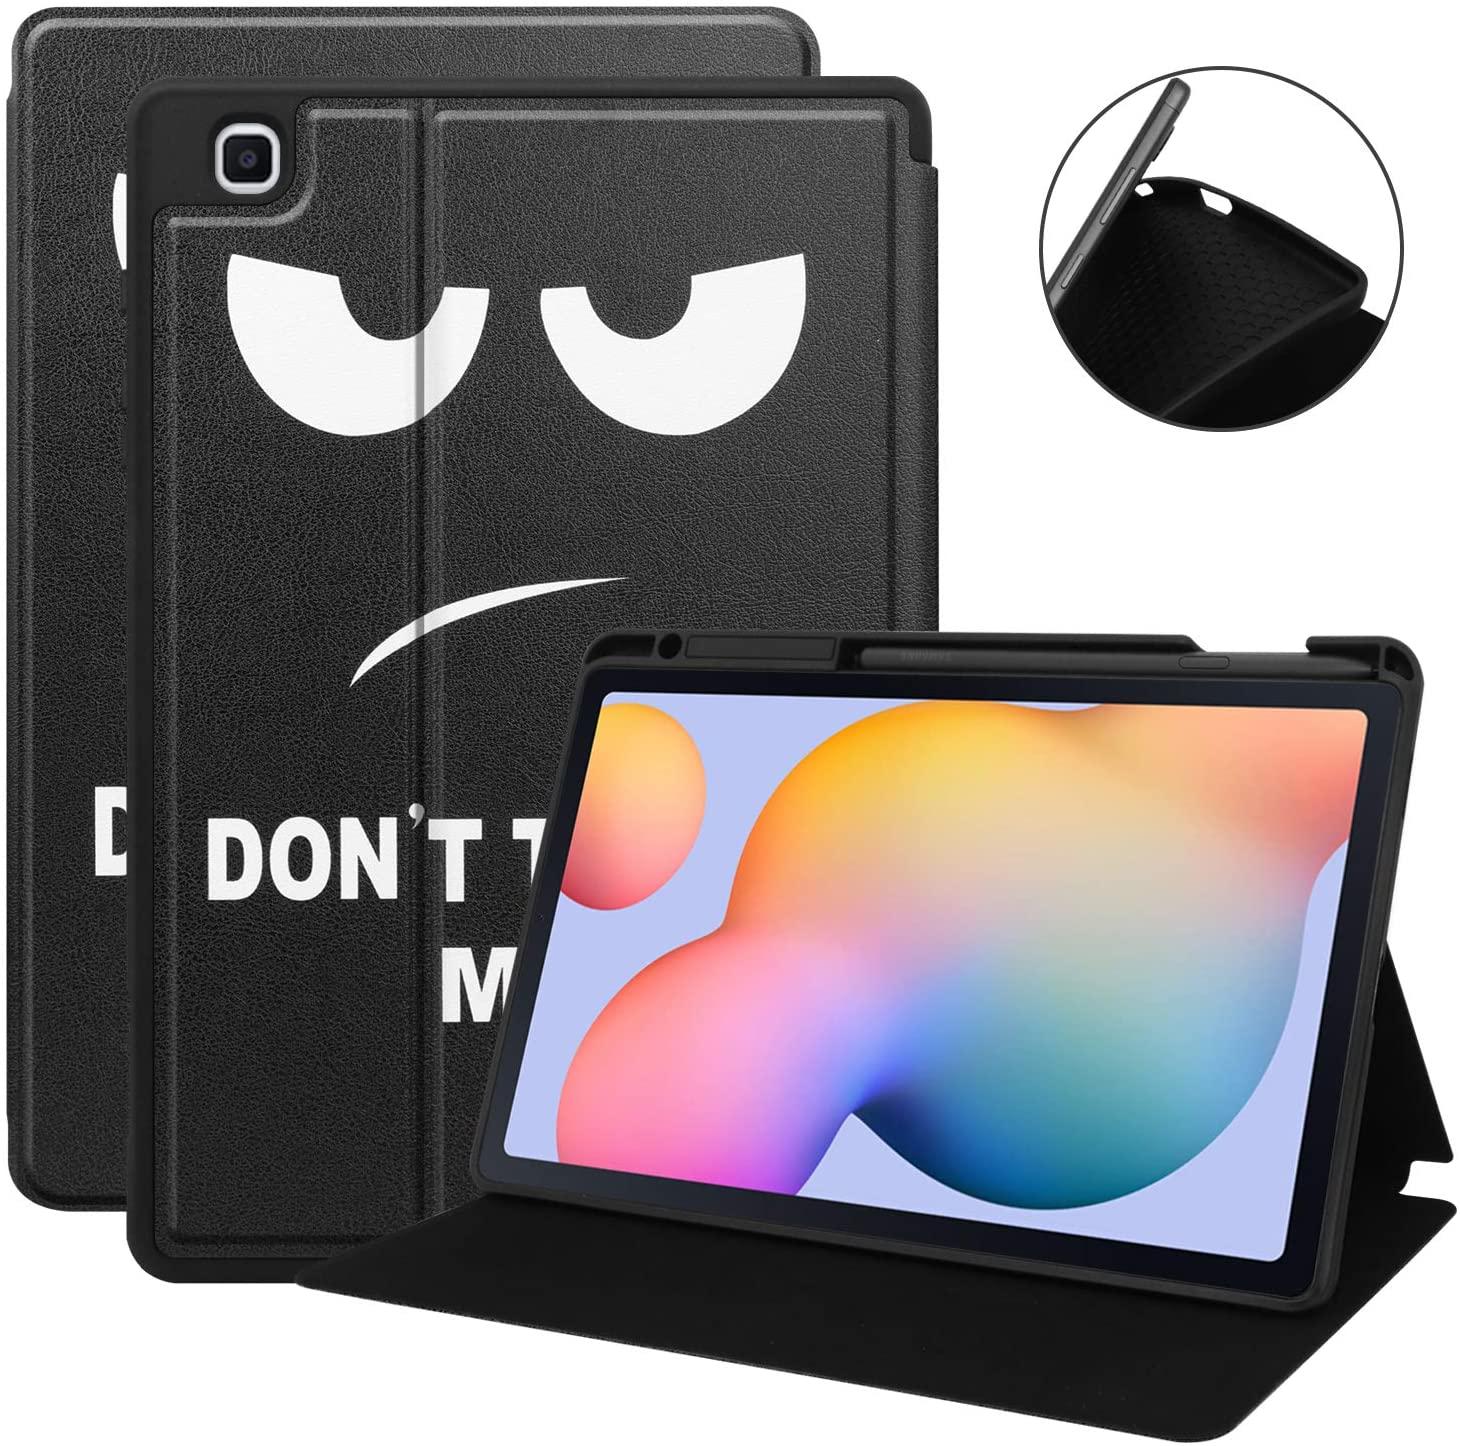 KuRoKo Galaxy Tab S6 lite 10.4 Sleep Case with Pen Holder- Ultra Slim TPU Backshell Folio Stand Cover with Multi-Viewing Angles for Galaxy Tab S6 lite 10.4 SM-P610/P615